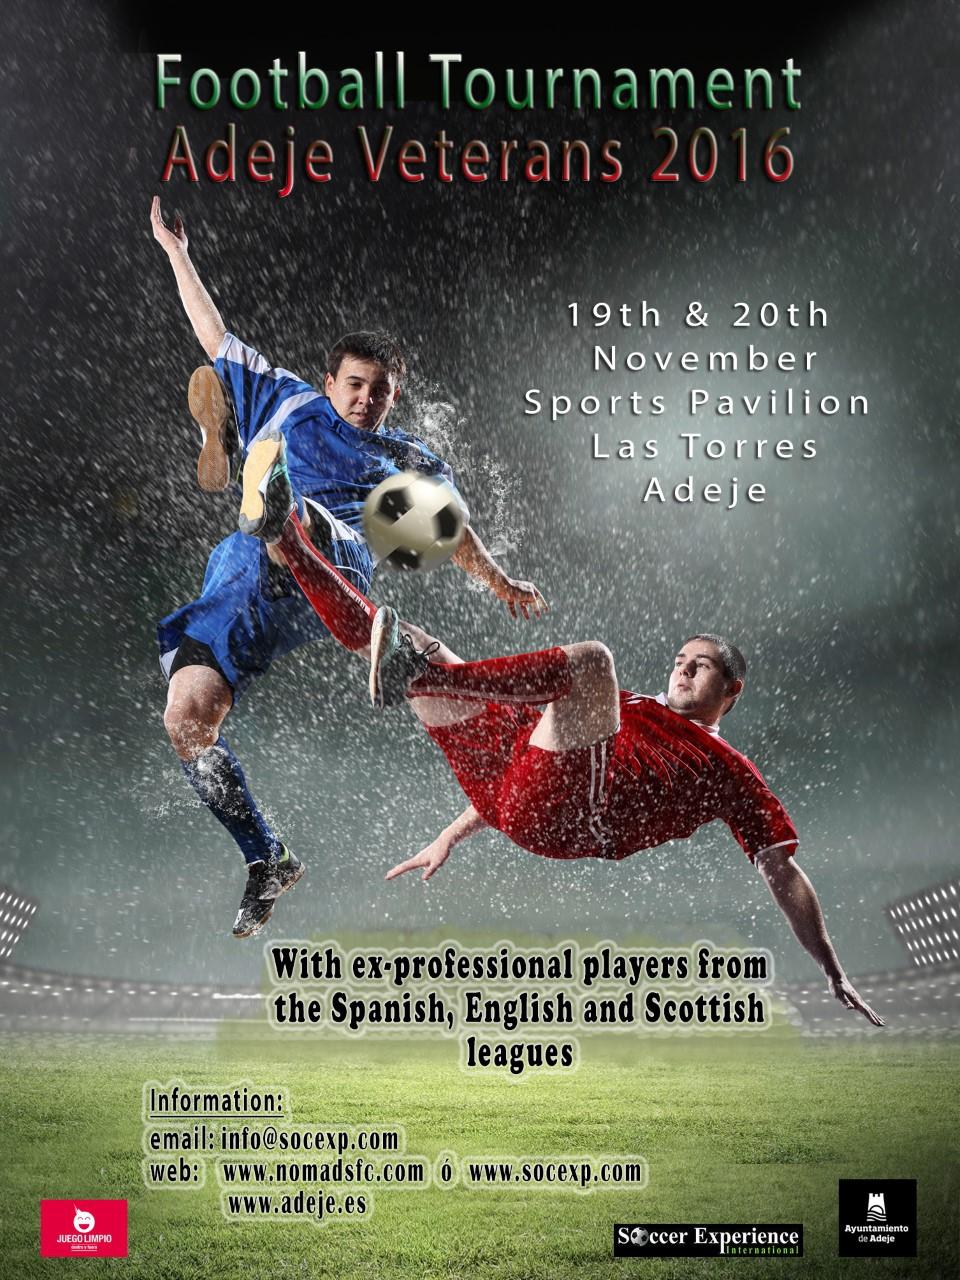 Soccer Experience Football Tournament Adeje